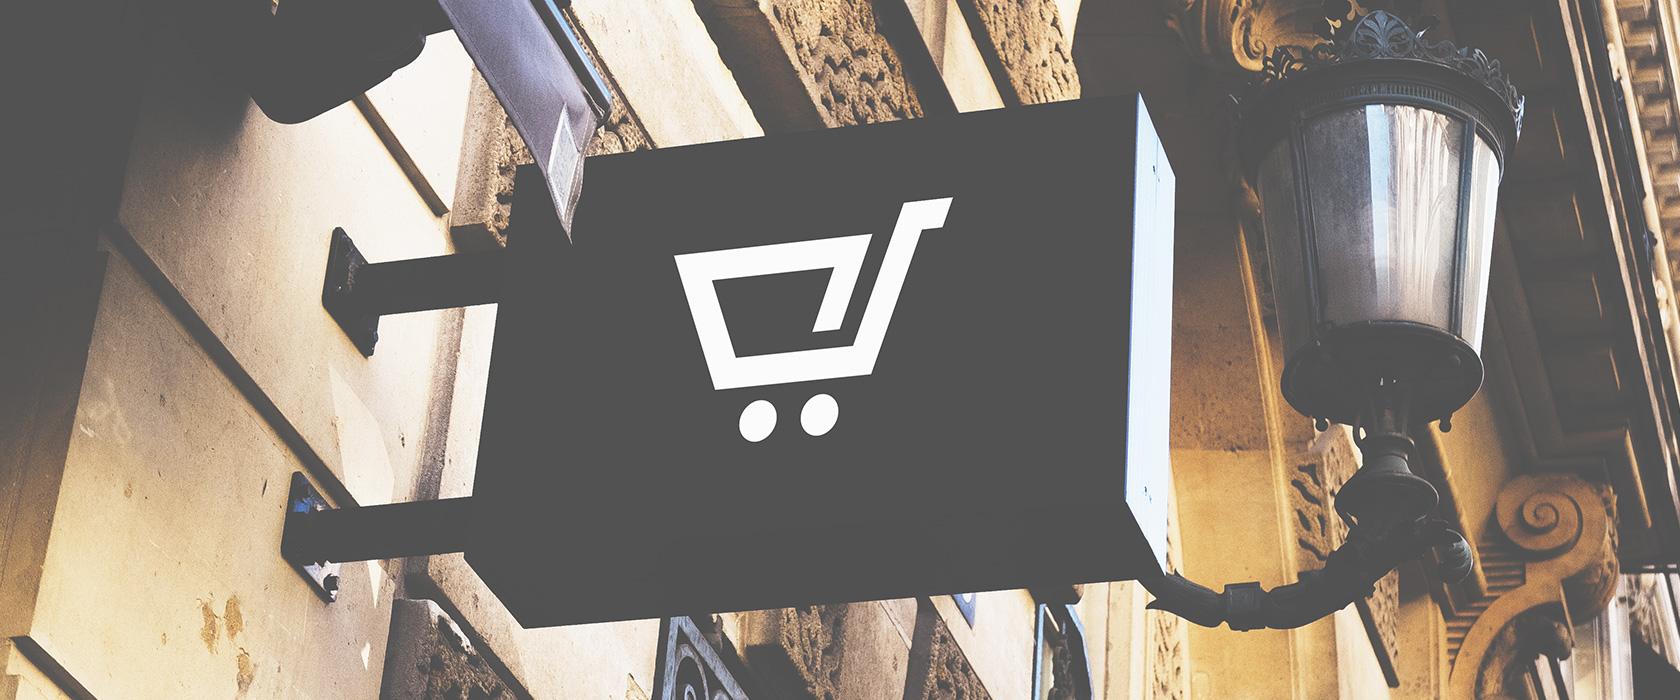 Content Optimization for eCommerce Websites